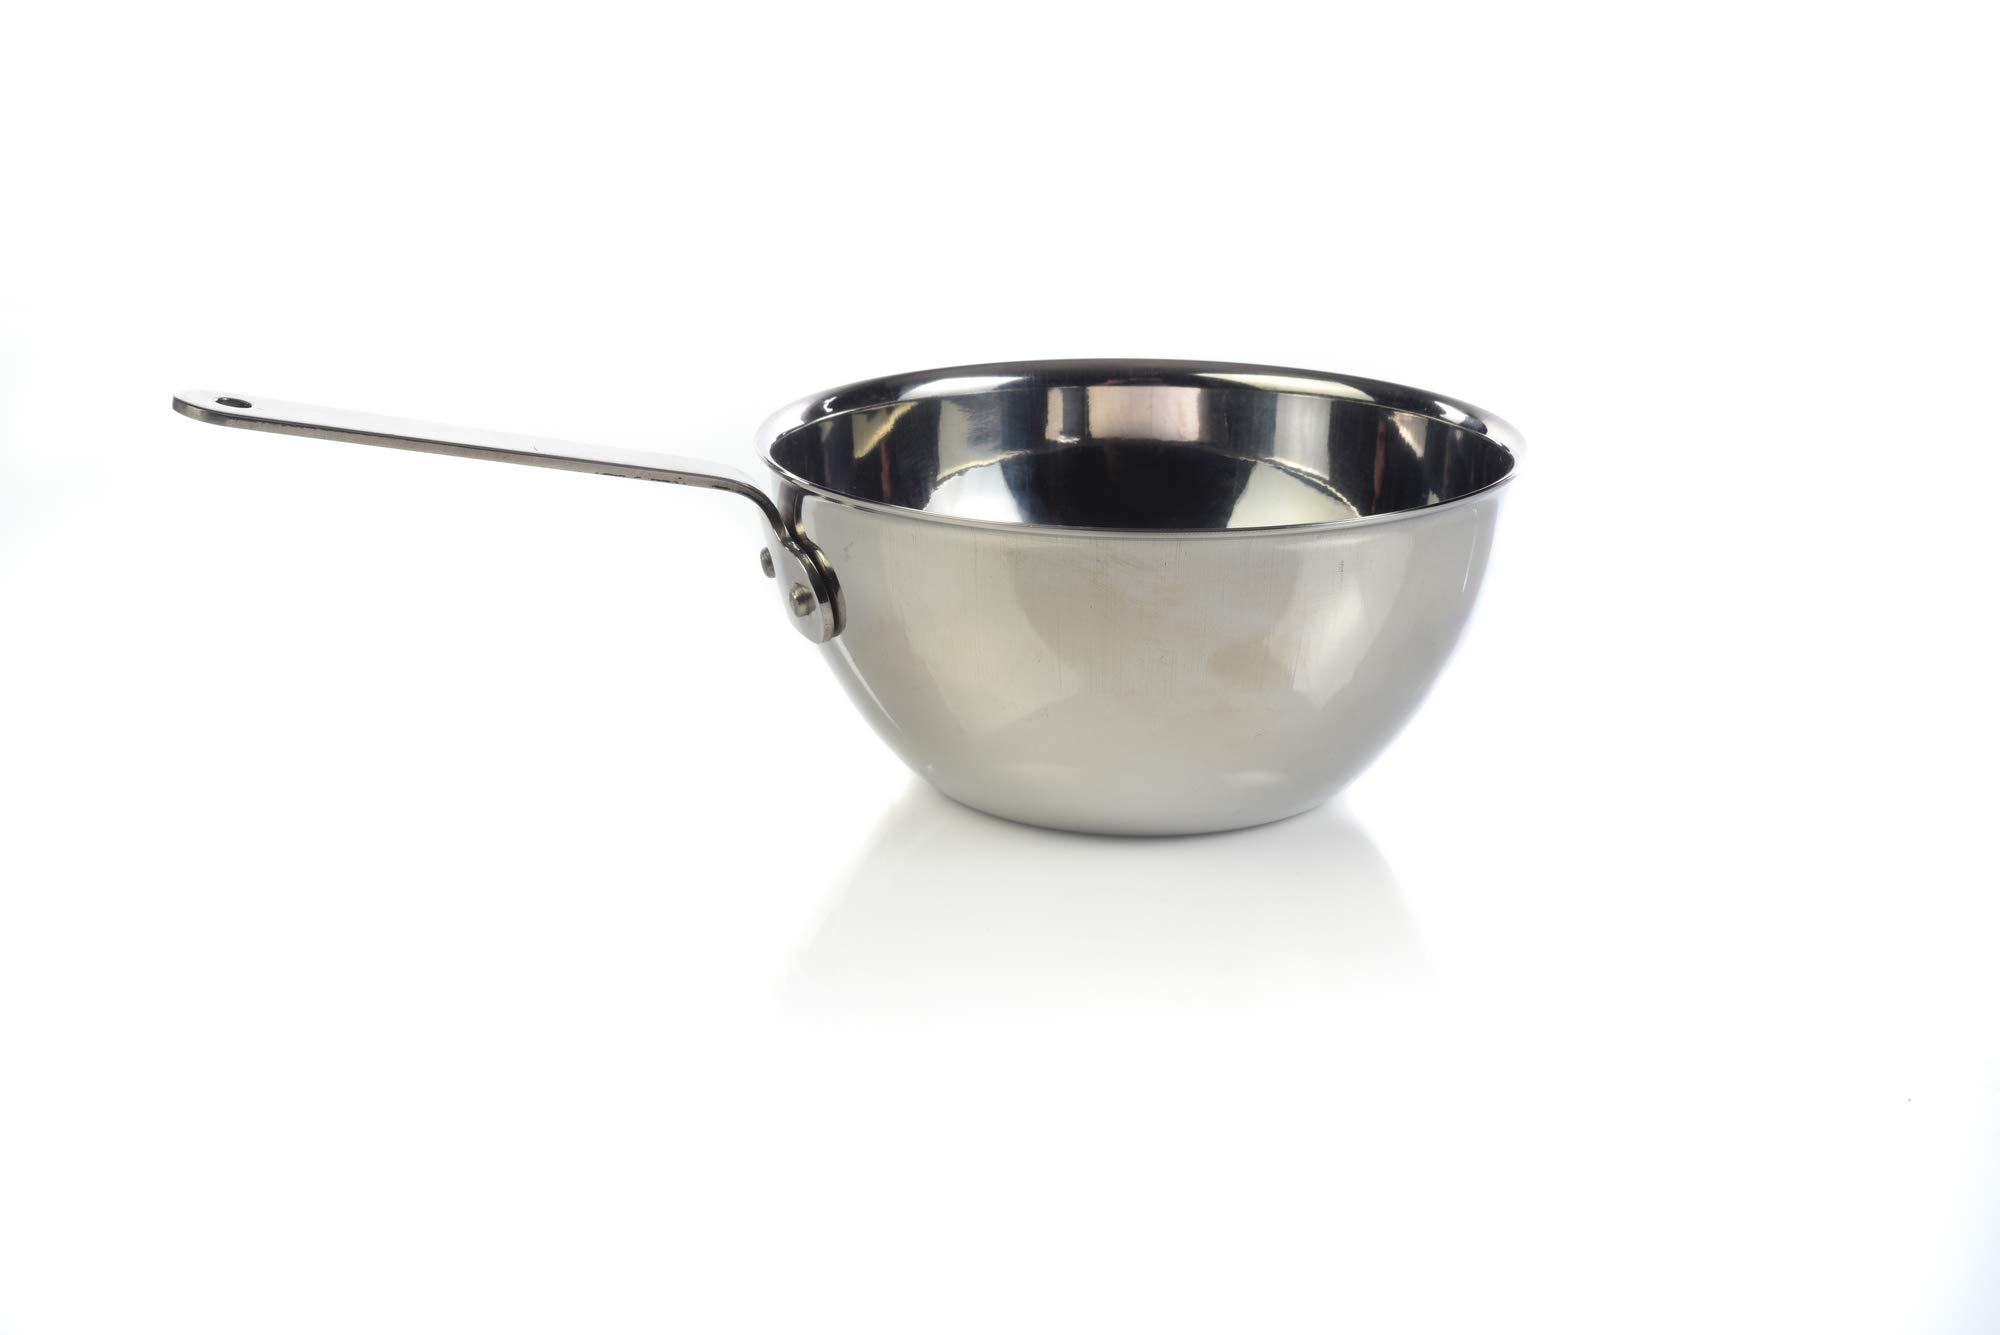 IMPULSE! Zurich Stainless Steel Mini Wok, Sauce pan, Appetizer Server